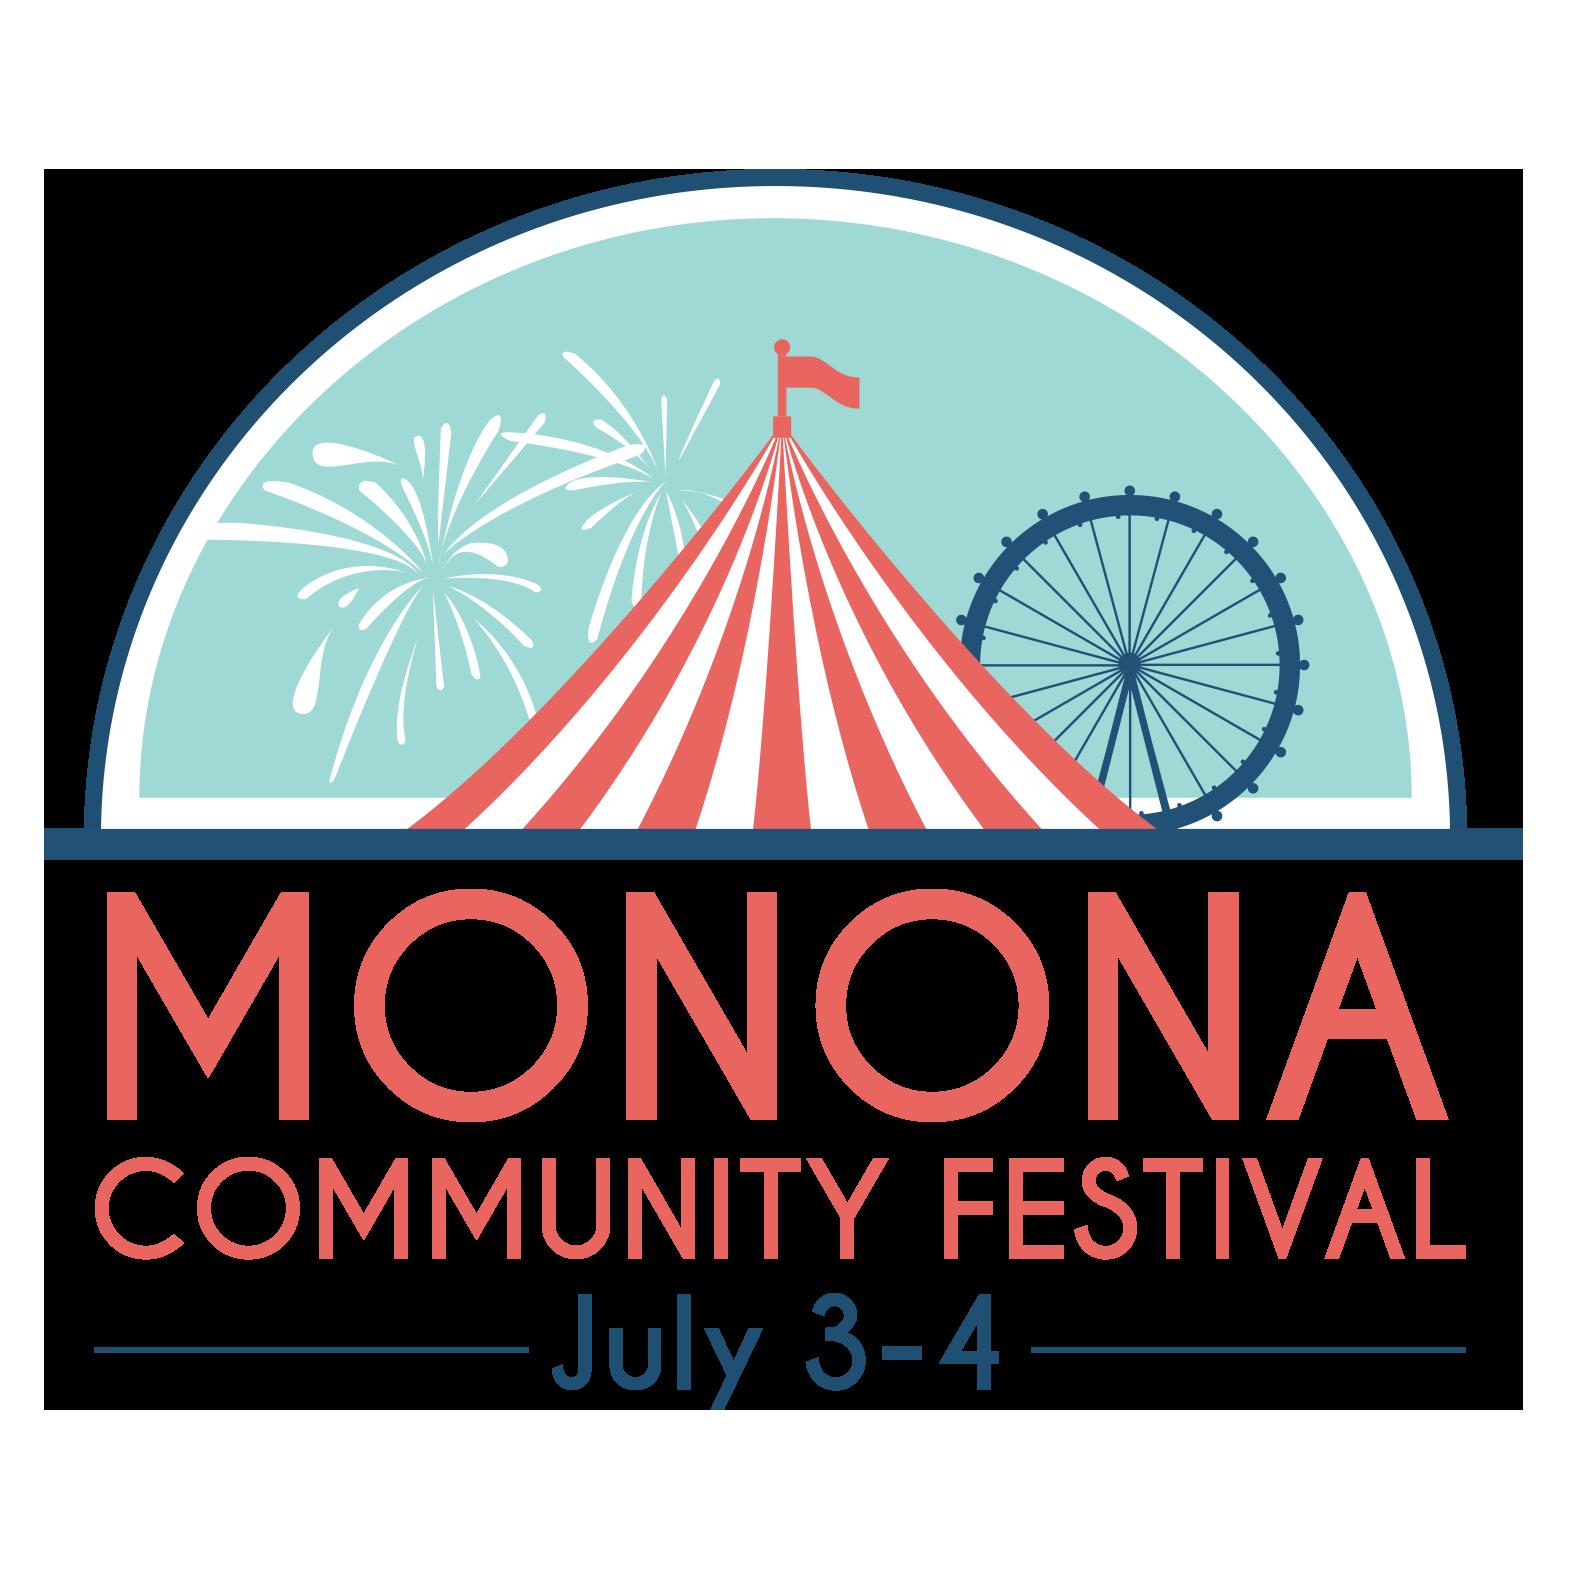 Monona community festival july. Clipart fireworks family event